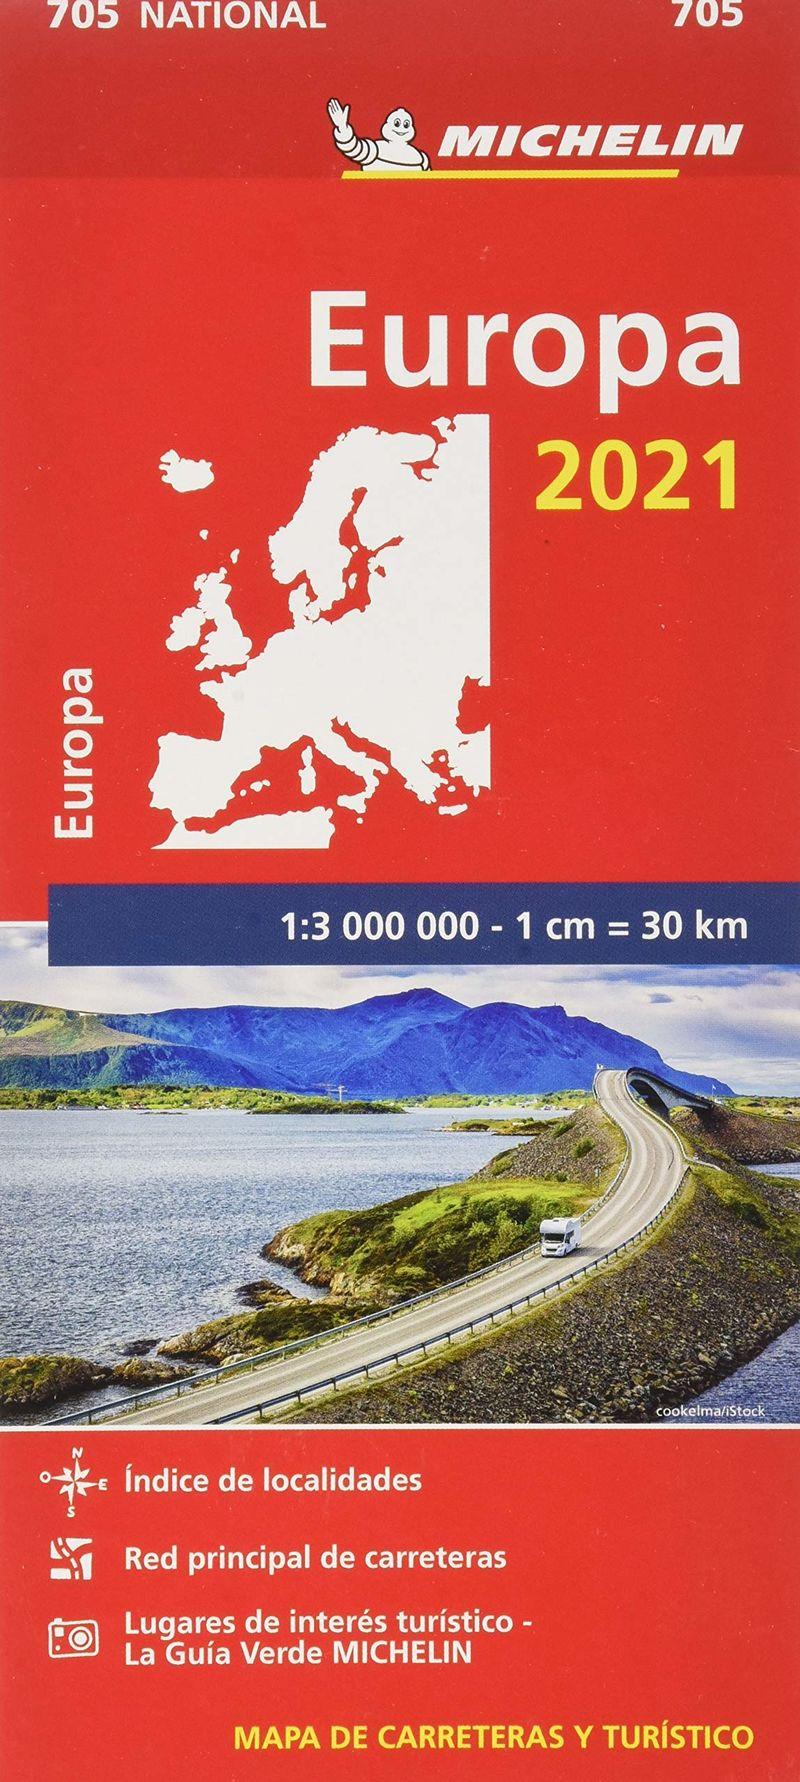 MAPA NATIONAL EUROPA 705 (2021)